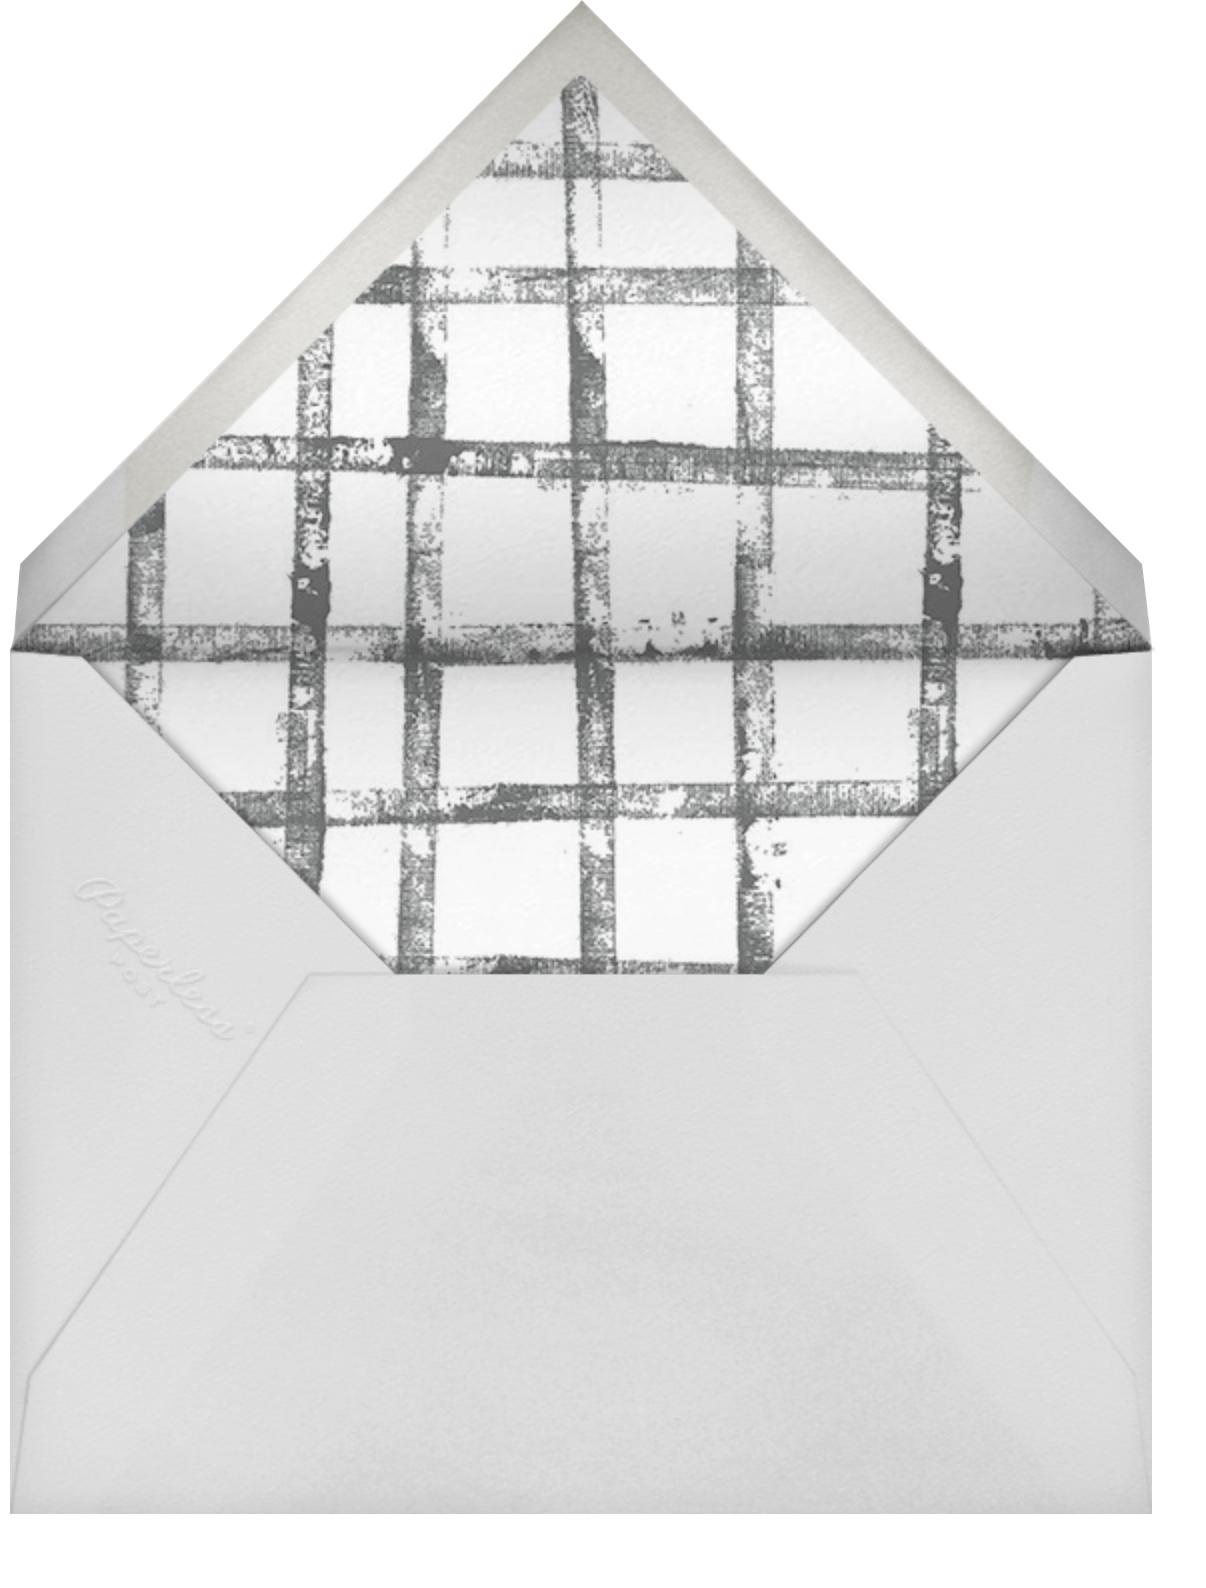 Alchemy - Kelly Wearstler - Professional events - envelope back